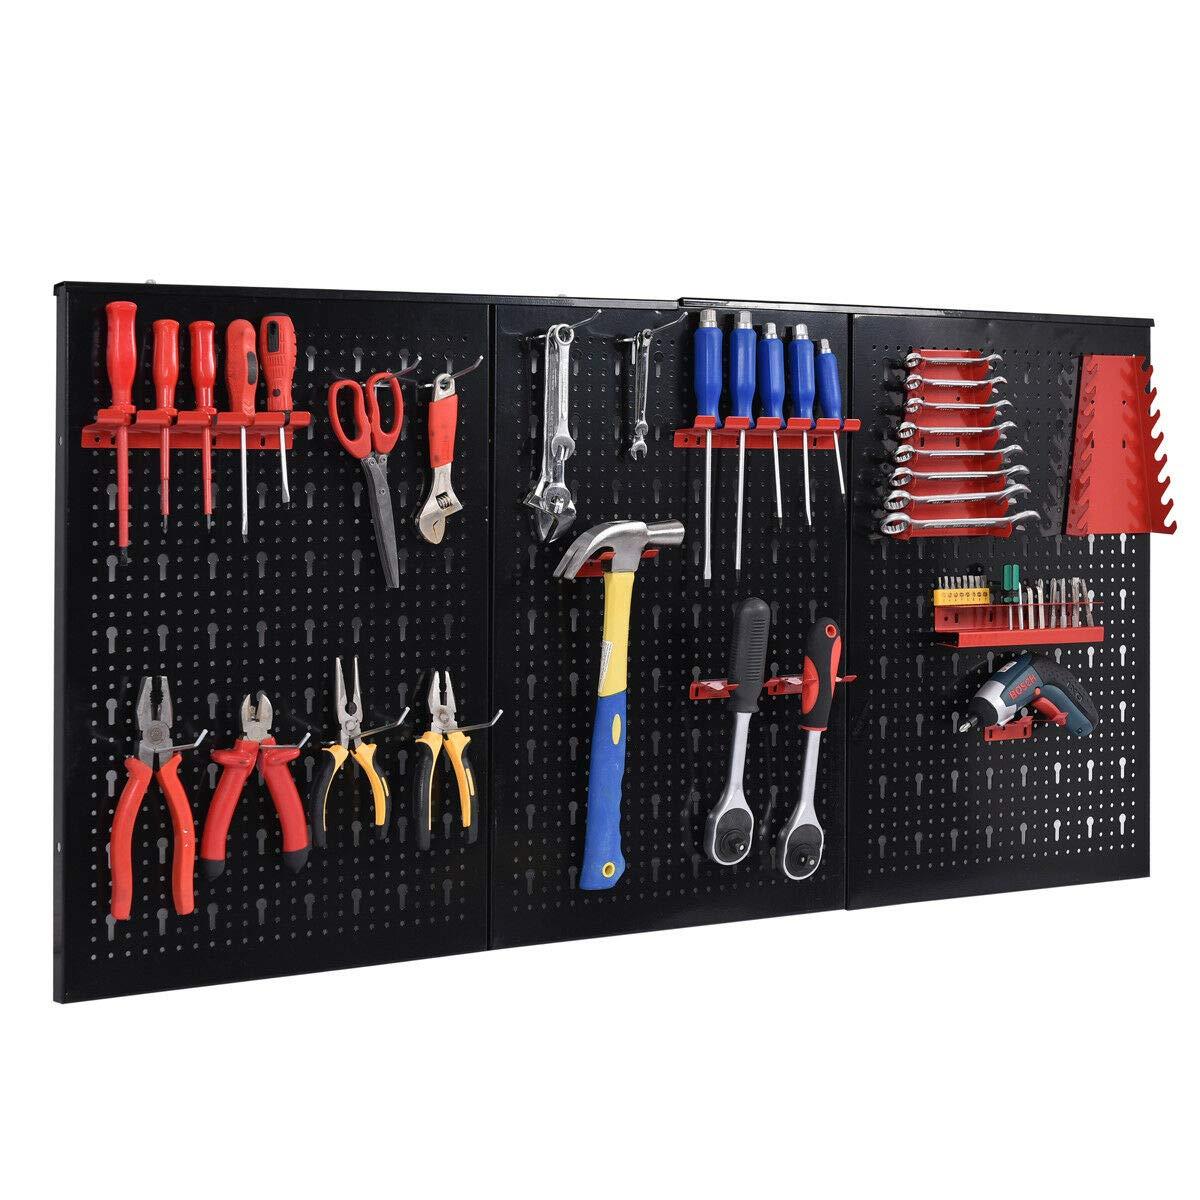 24'' x 48'' Metal Pegboard Panels Garage Tool Board Storage Organizer Holder Black by allgoodsdelight365 (Image #2)